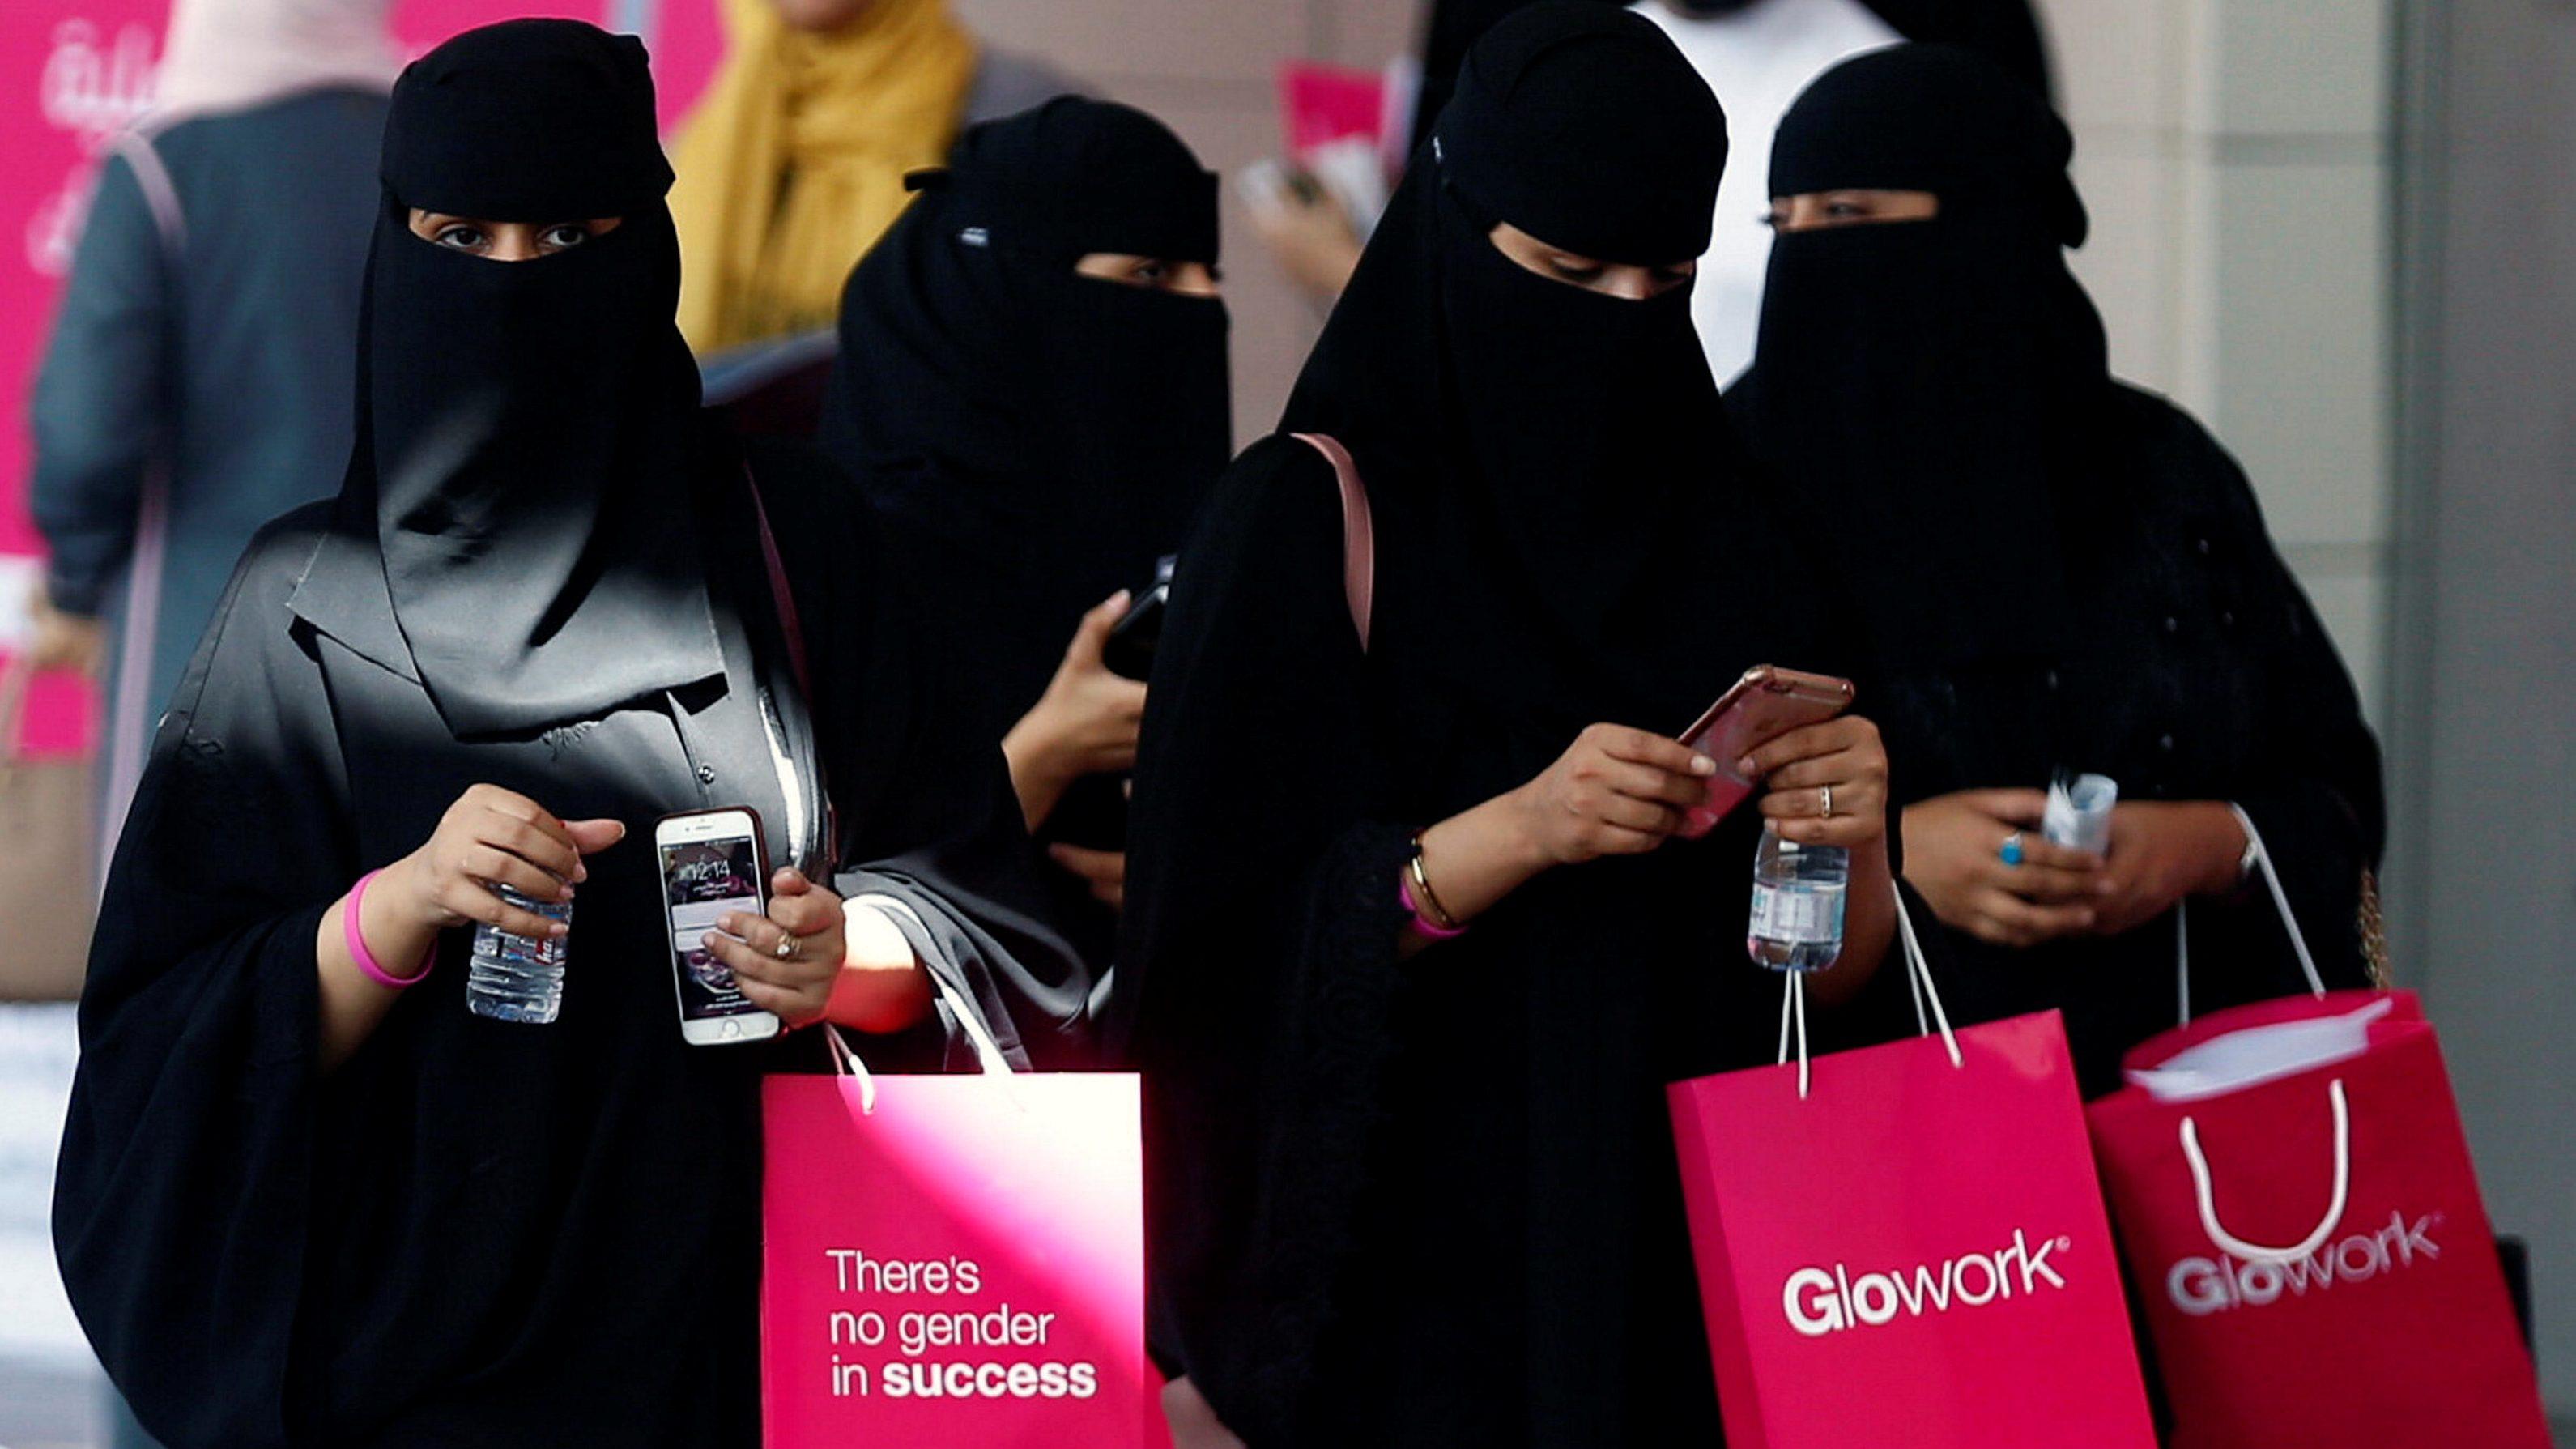 Saudi women take part in Glowork exhibition in Riyadh, Saudi Arabia September 28, 2017.